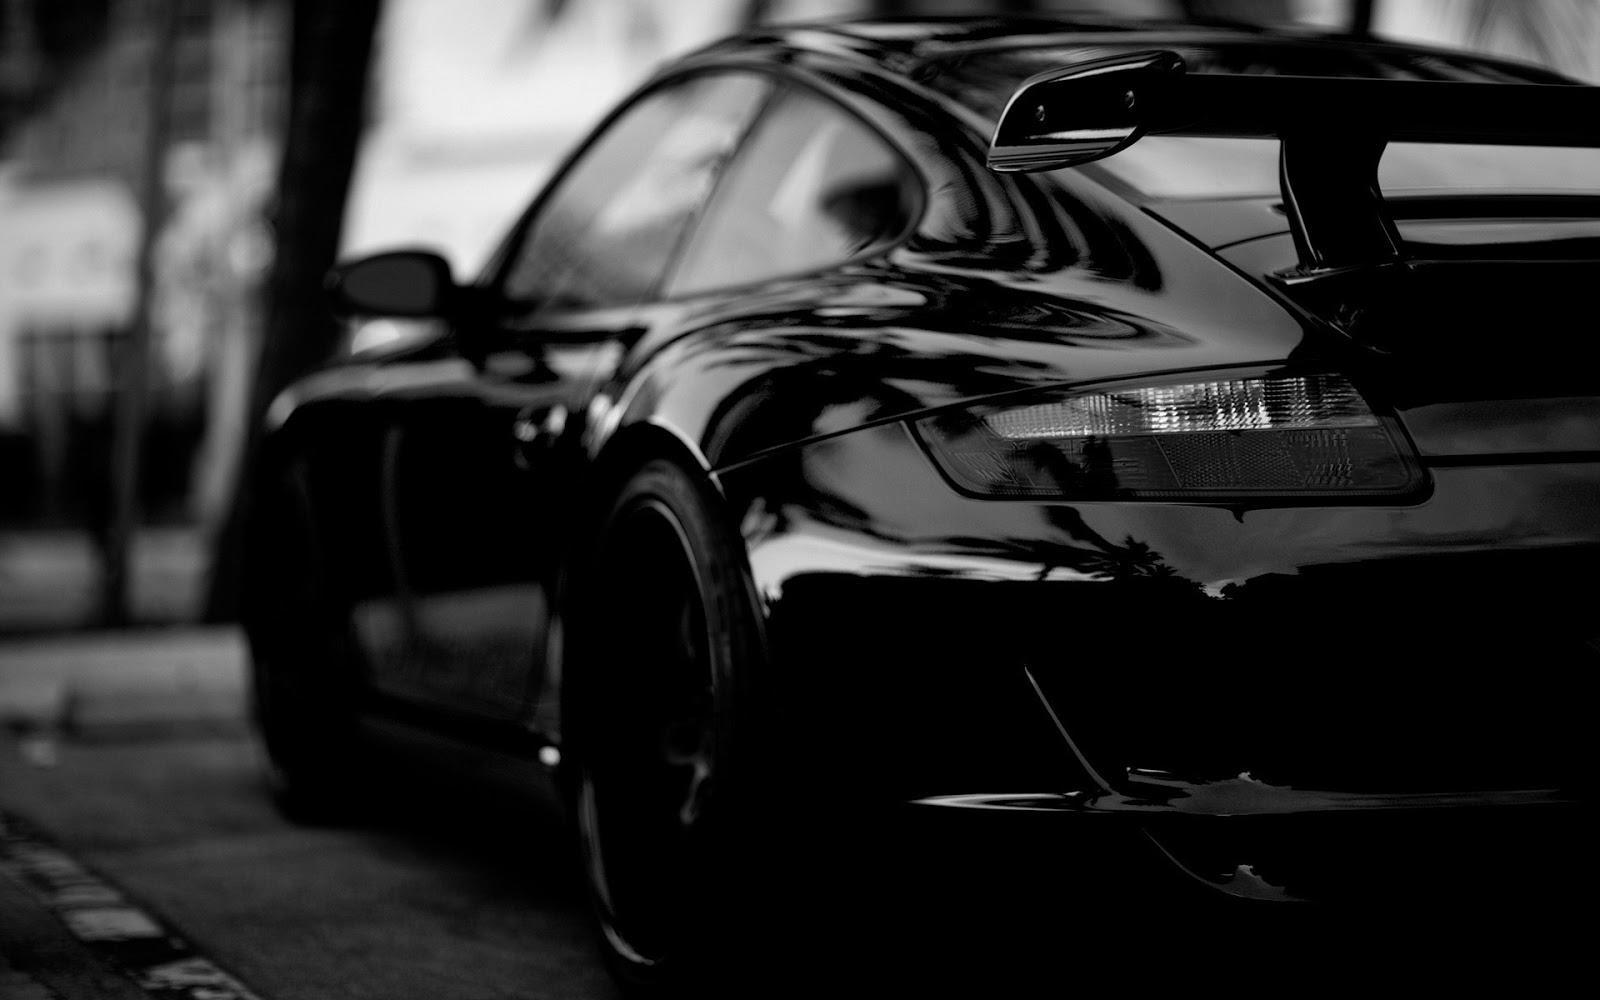 Desktop Wallpapers HD: Black Car Wallpapers